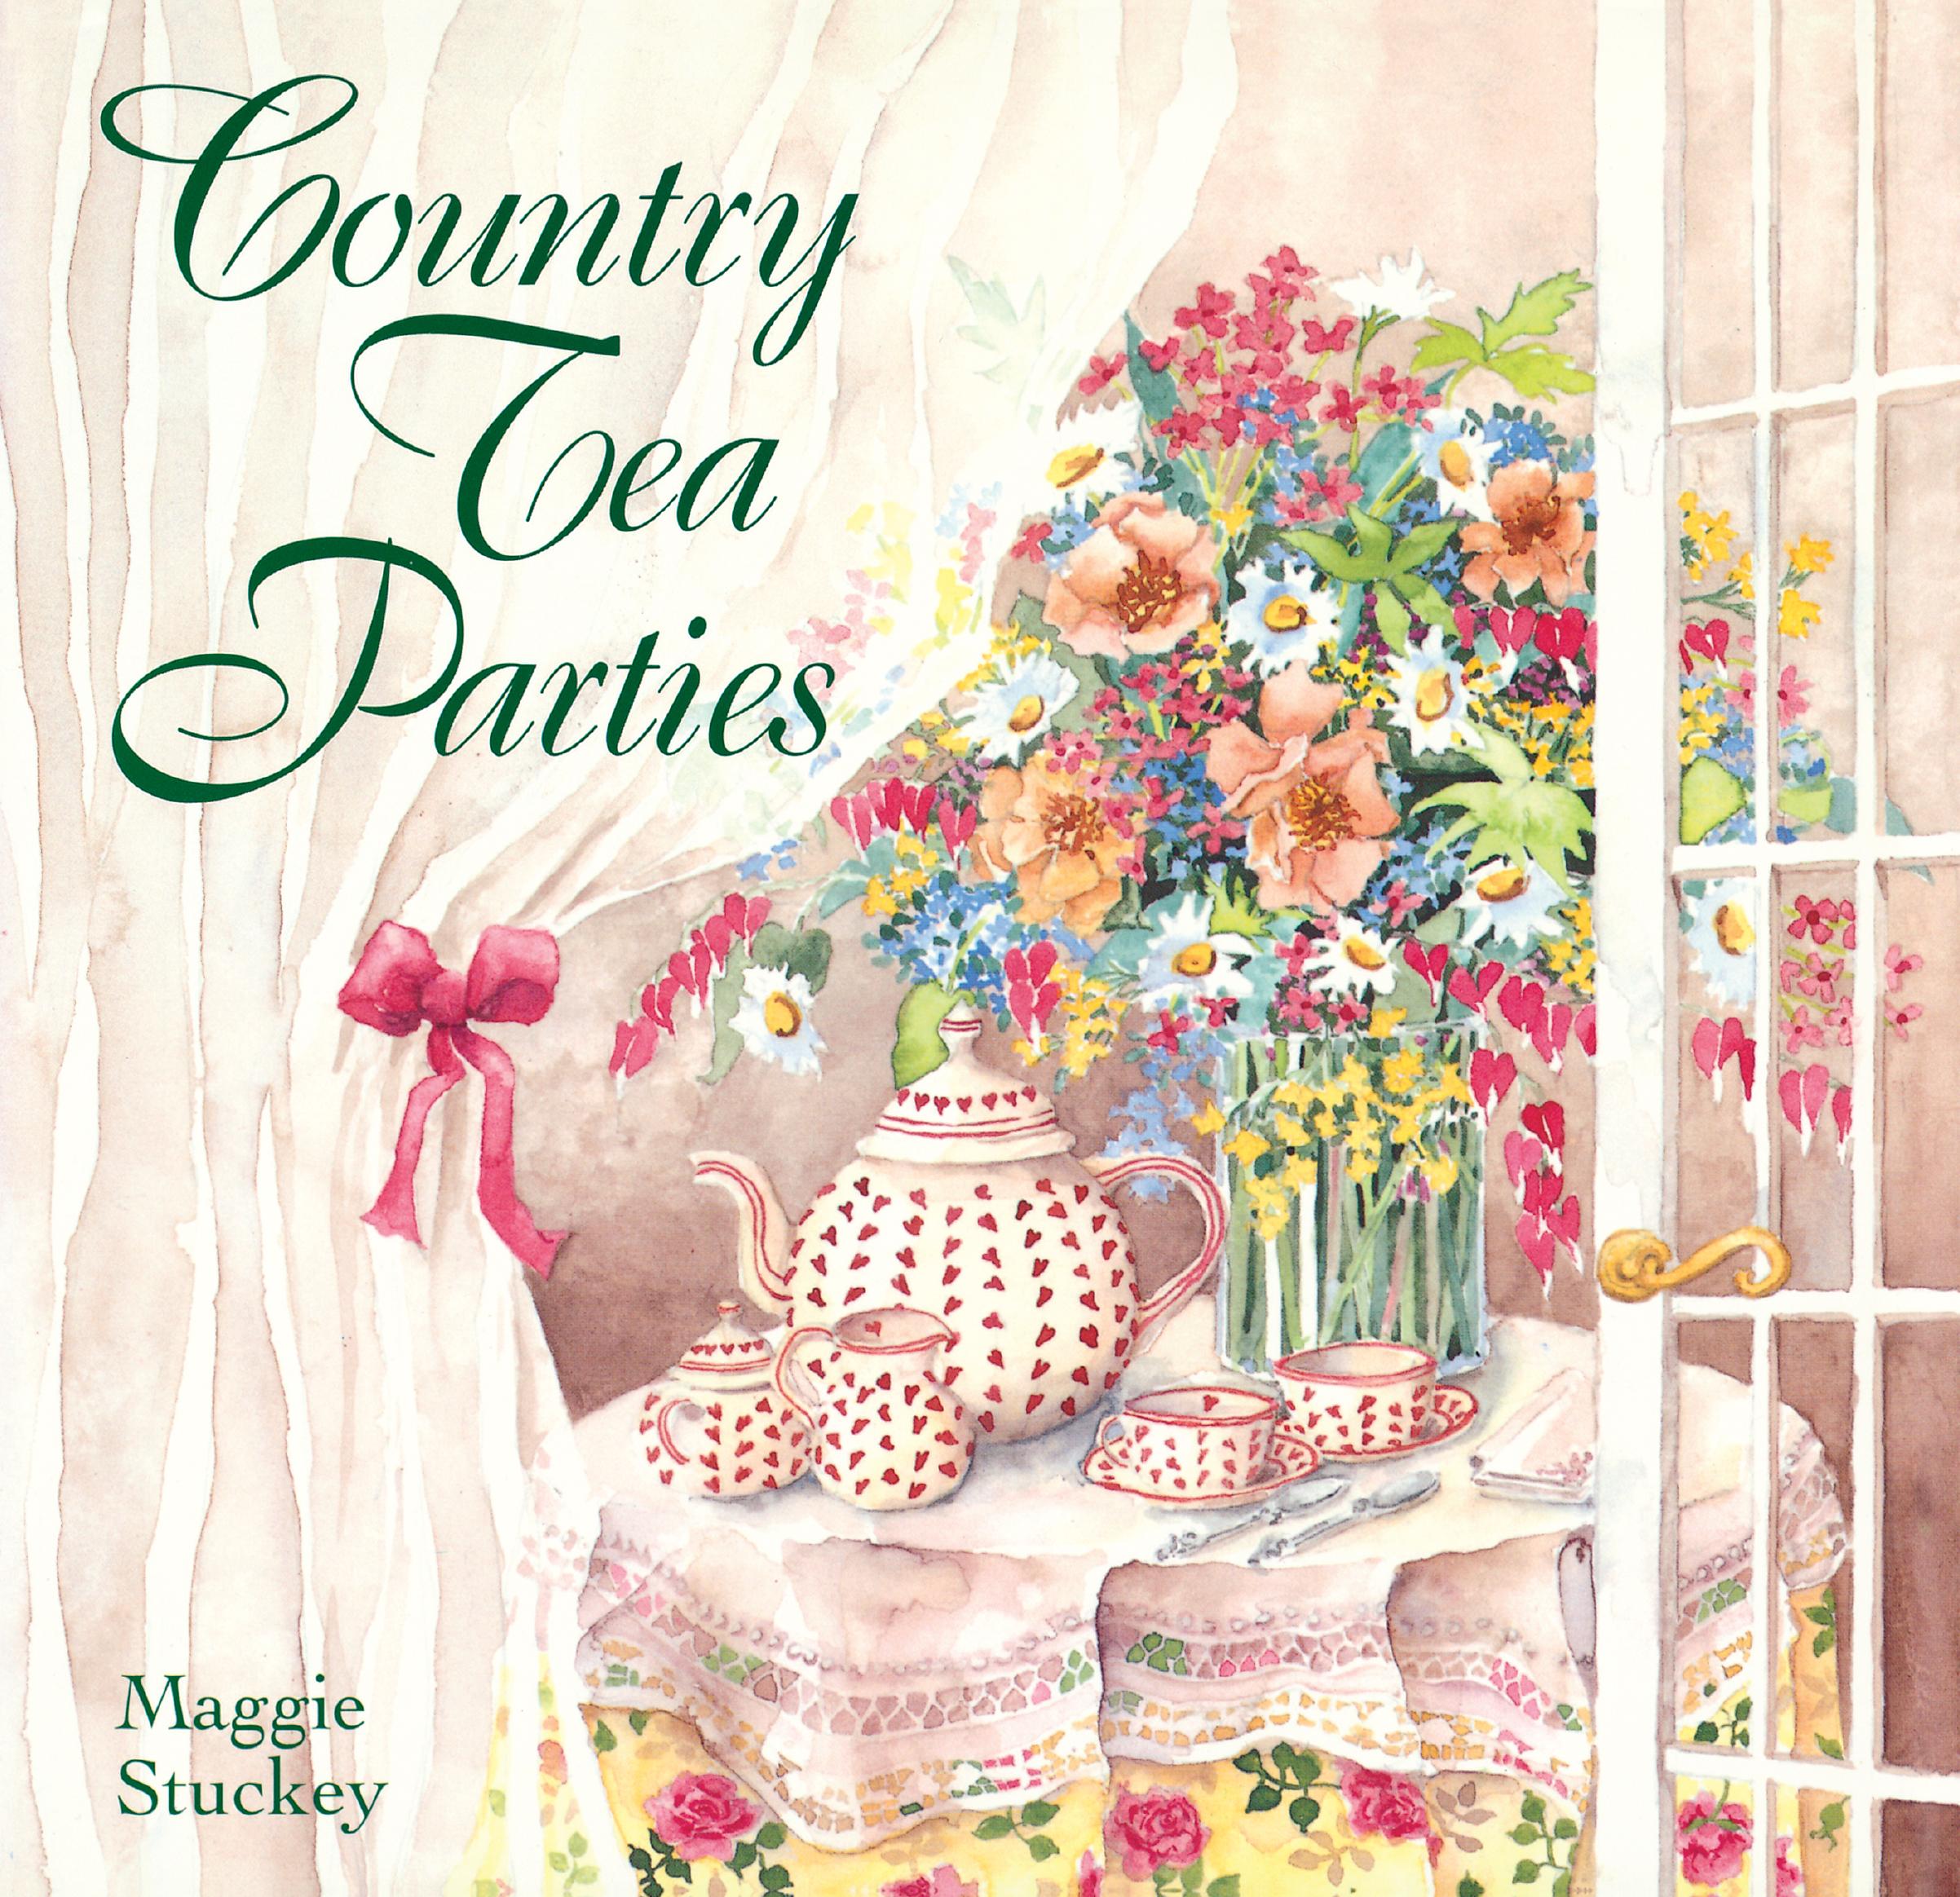 Country Tea Parties  - Maggie Stuckey